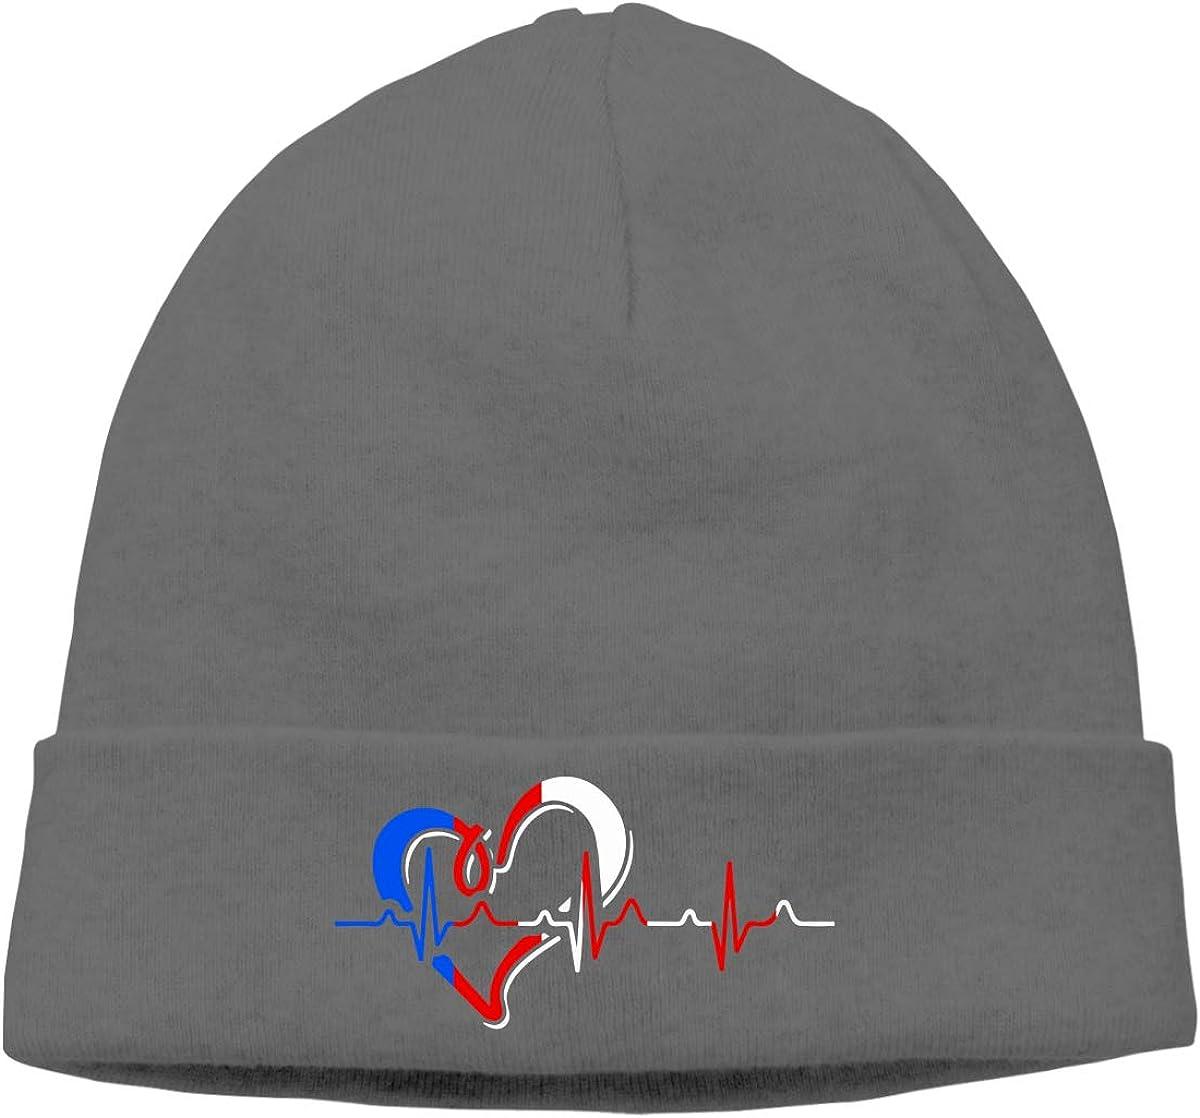 Unisex Puerto Rican Heartbeat Soft Beanie Hat